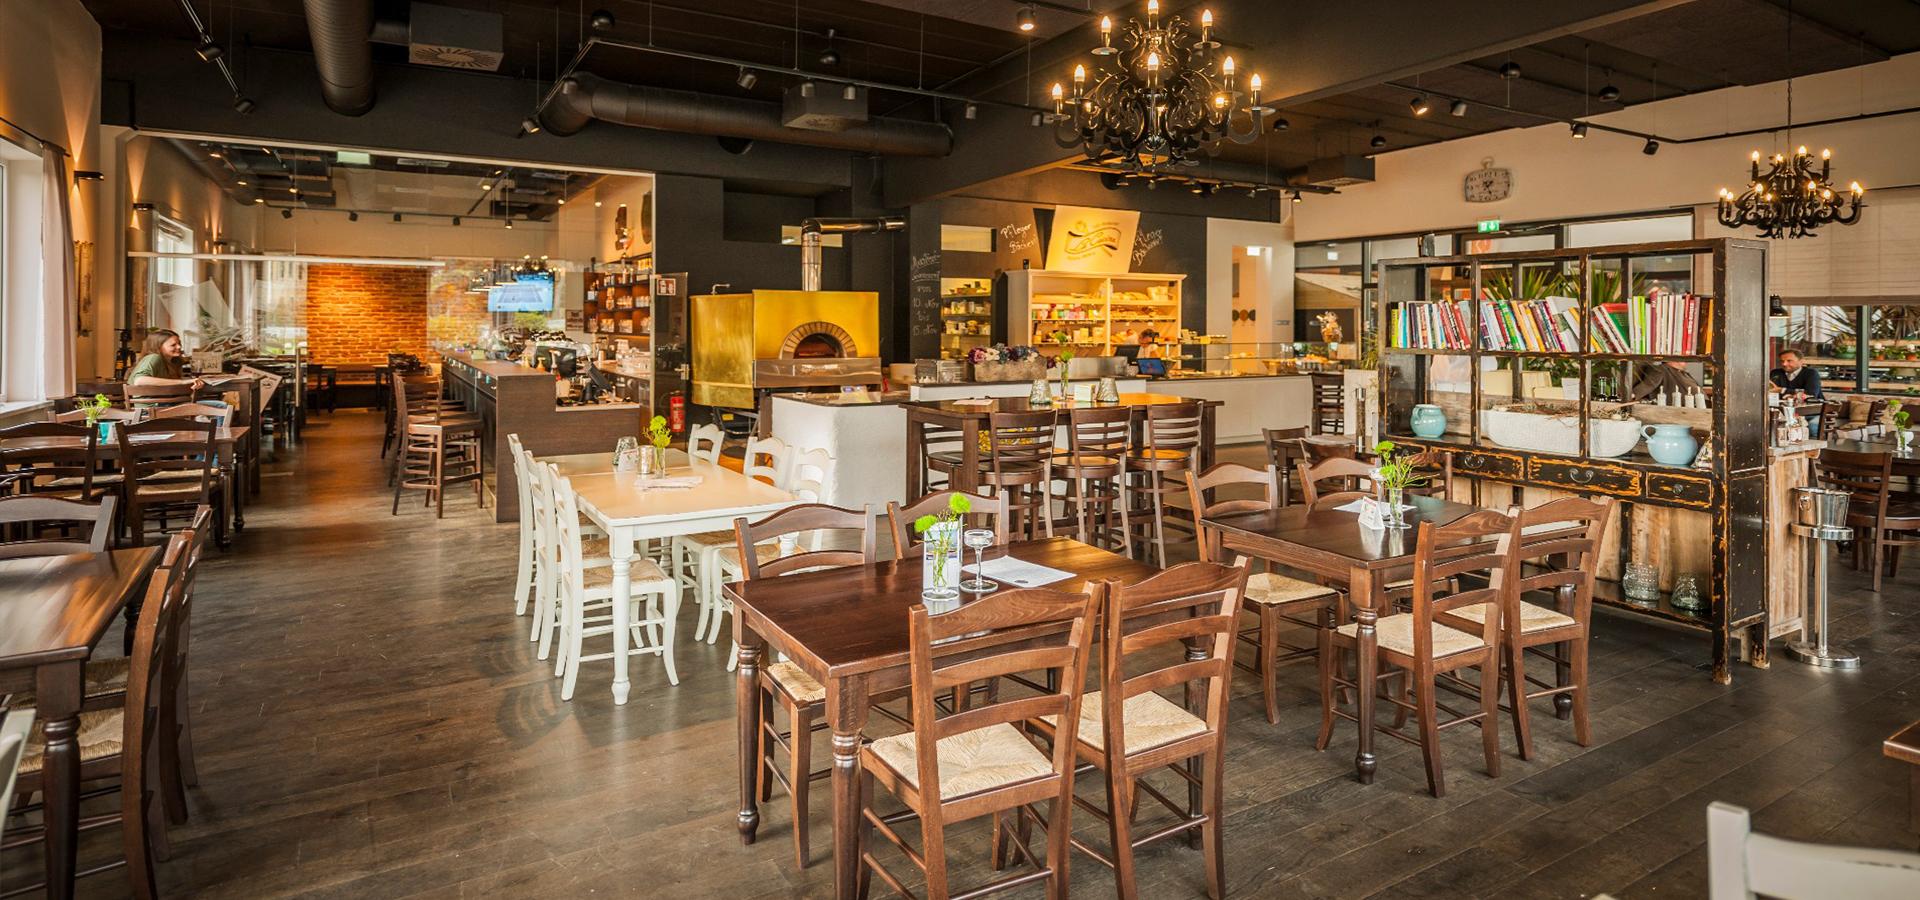 La Cucina Hotel & Restaurant